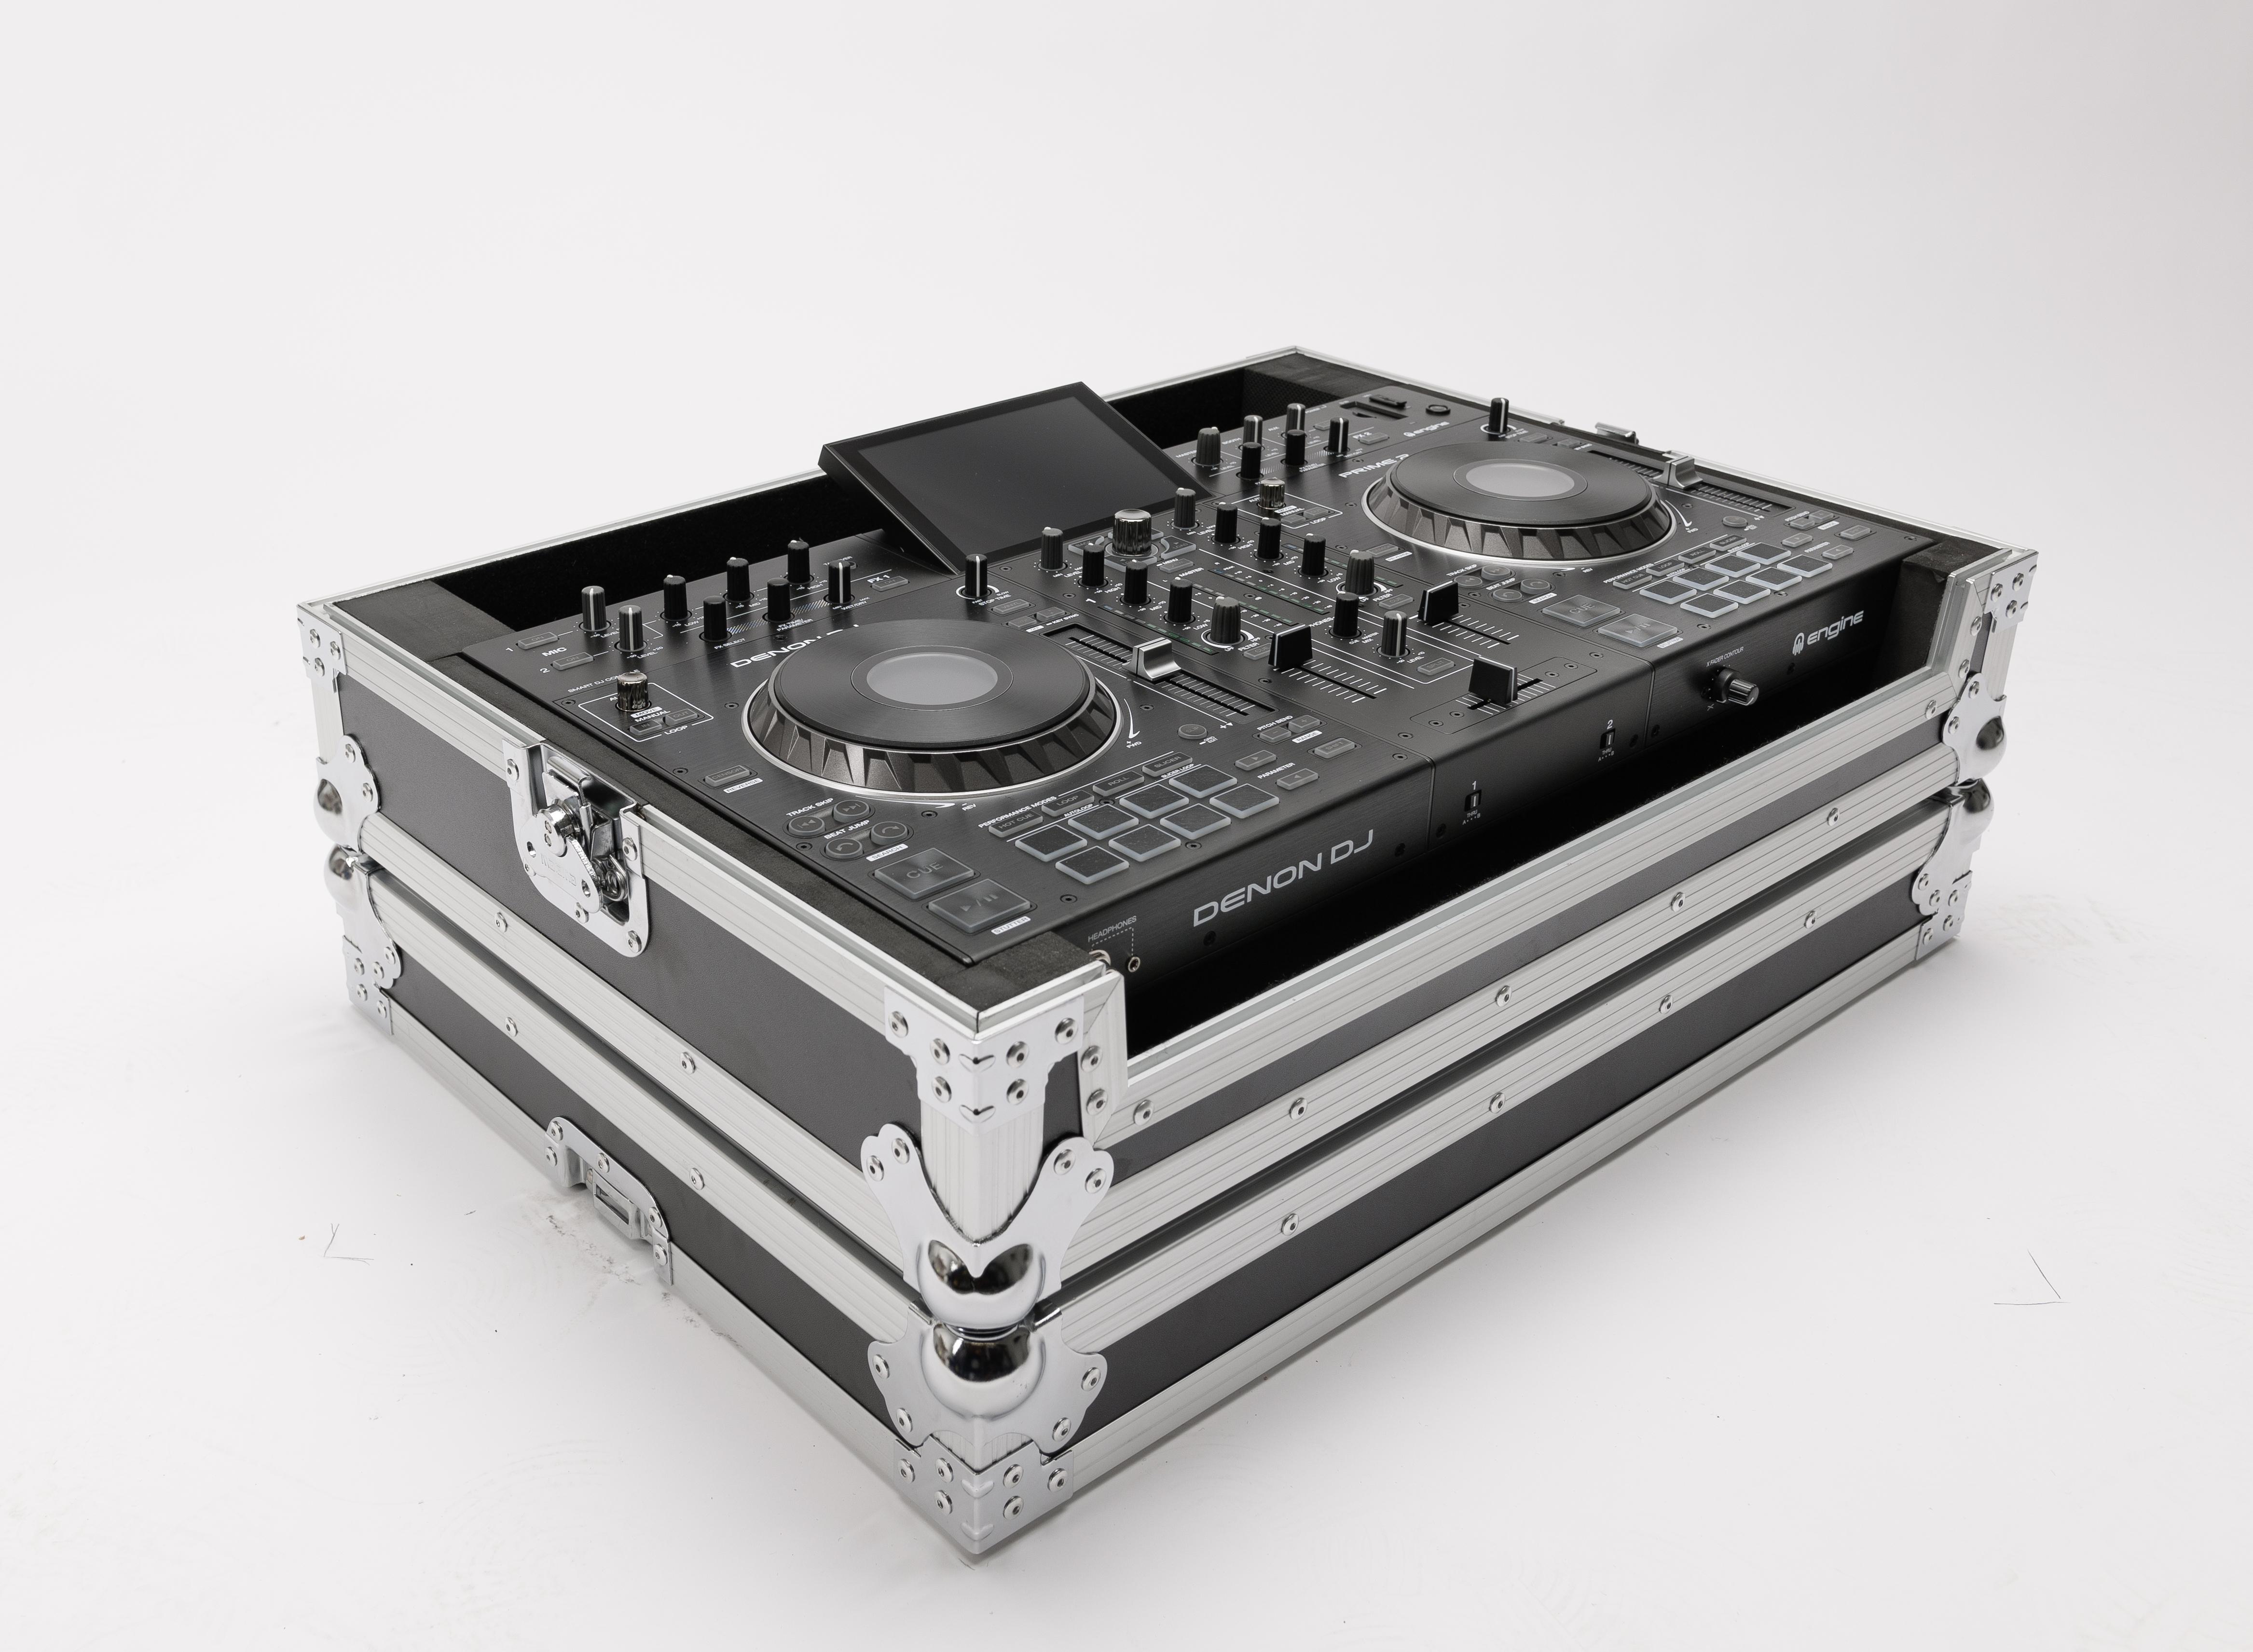 Denon DJ Prime Series Denon DJ PRIME 2 + Magma DJ-Controller Case 244279